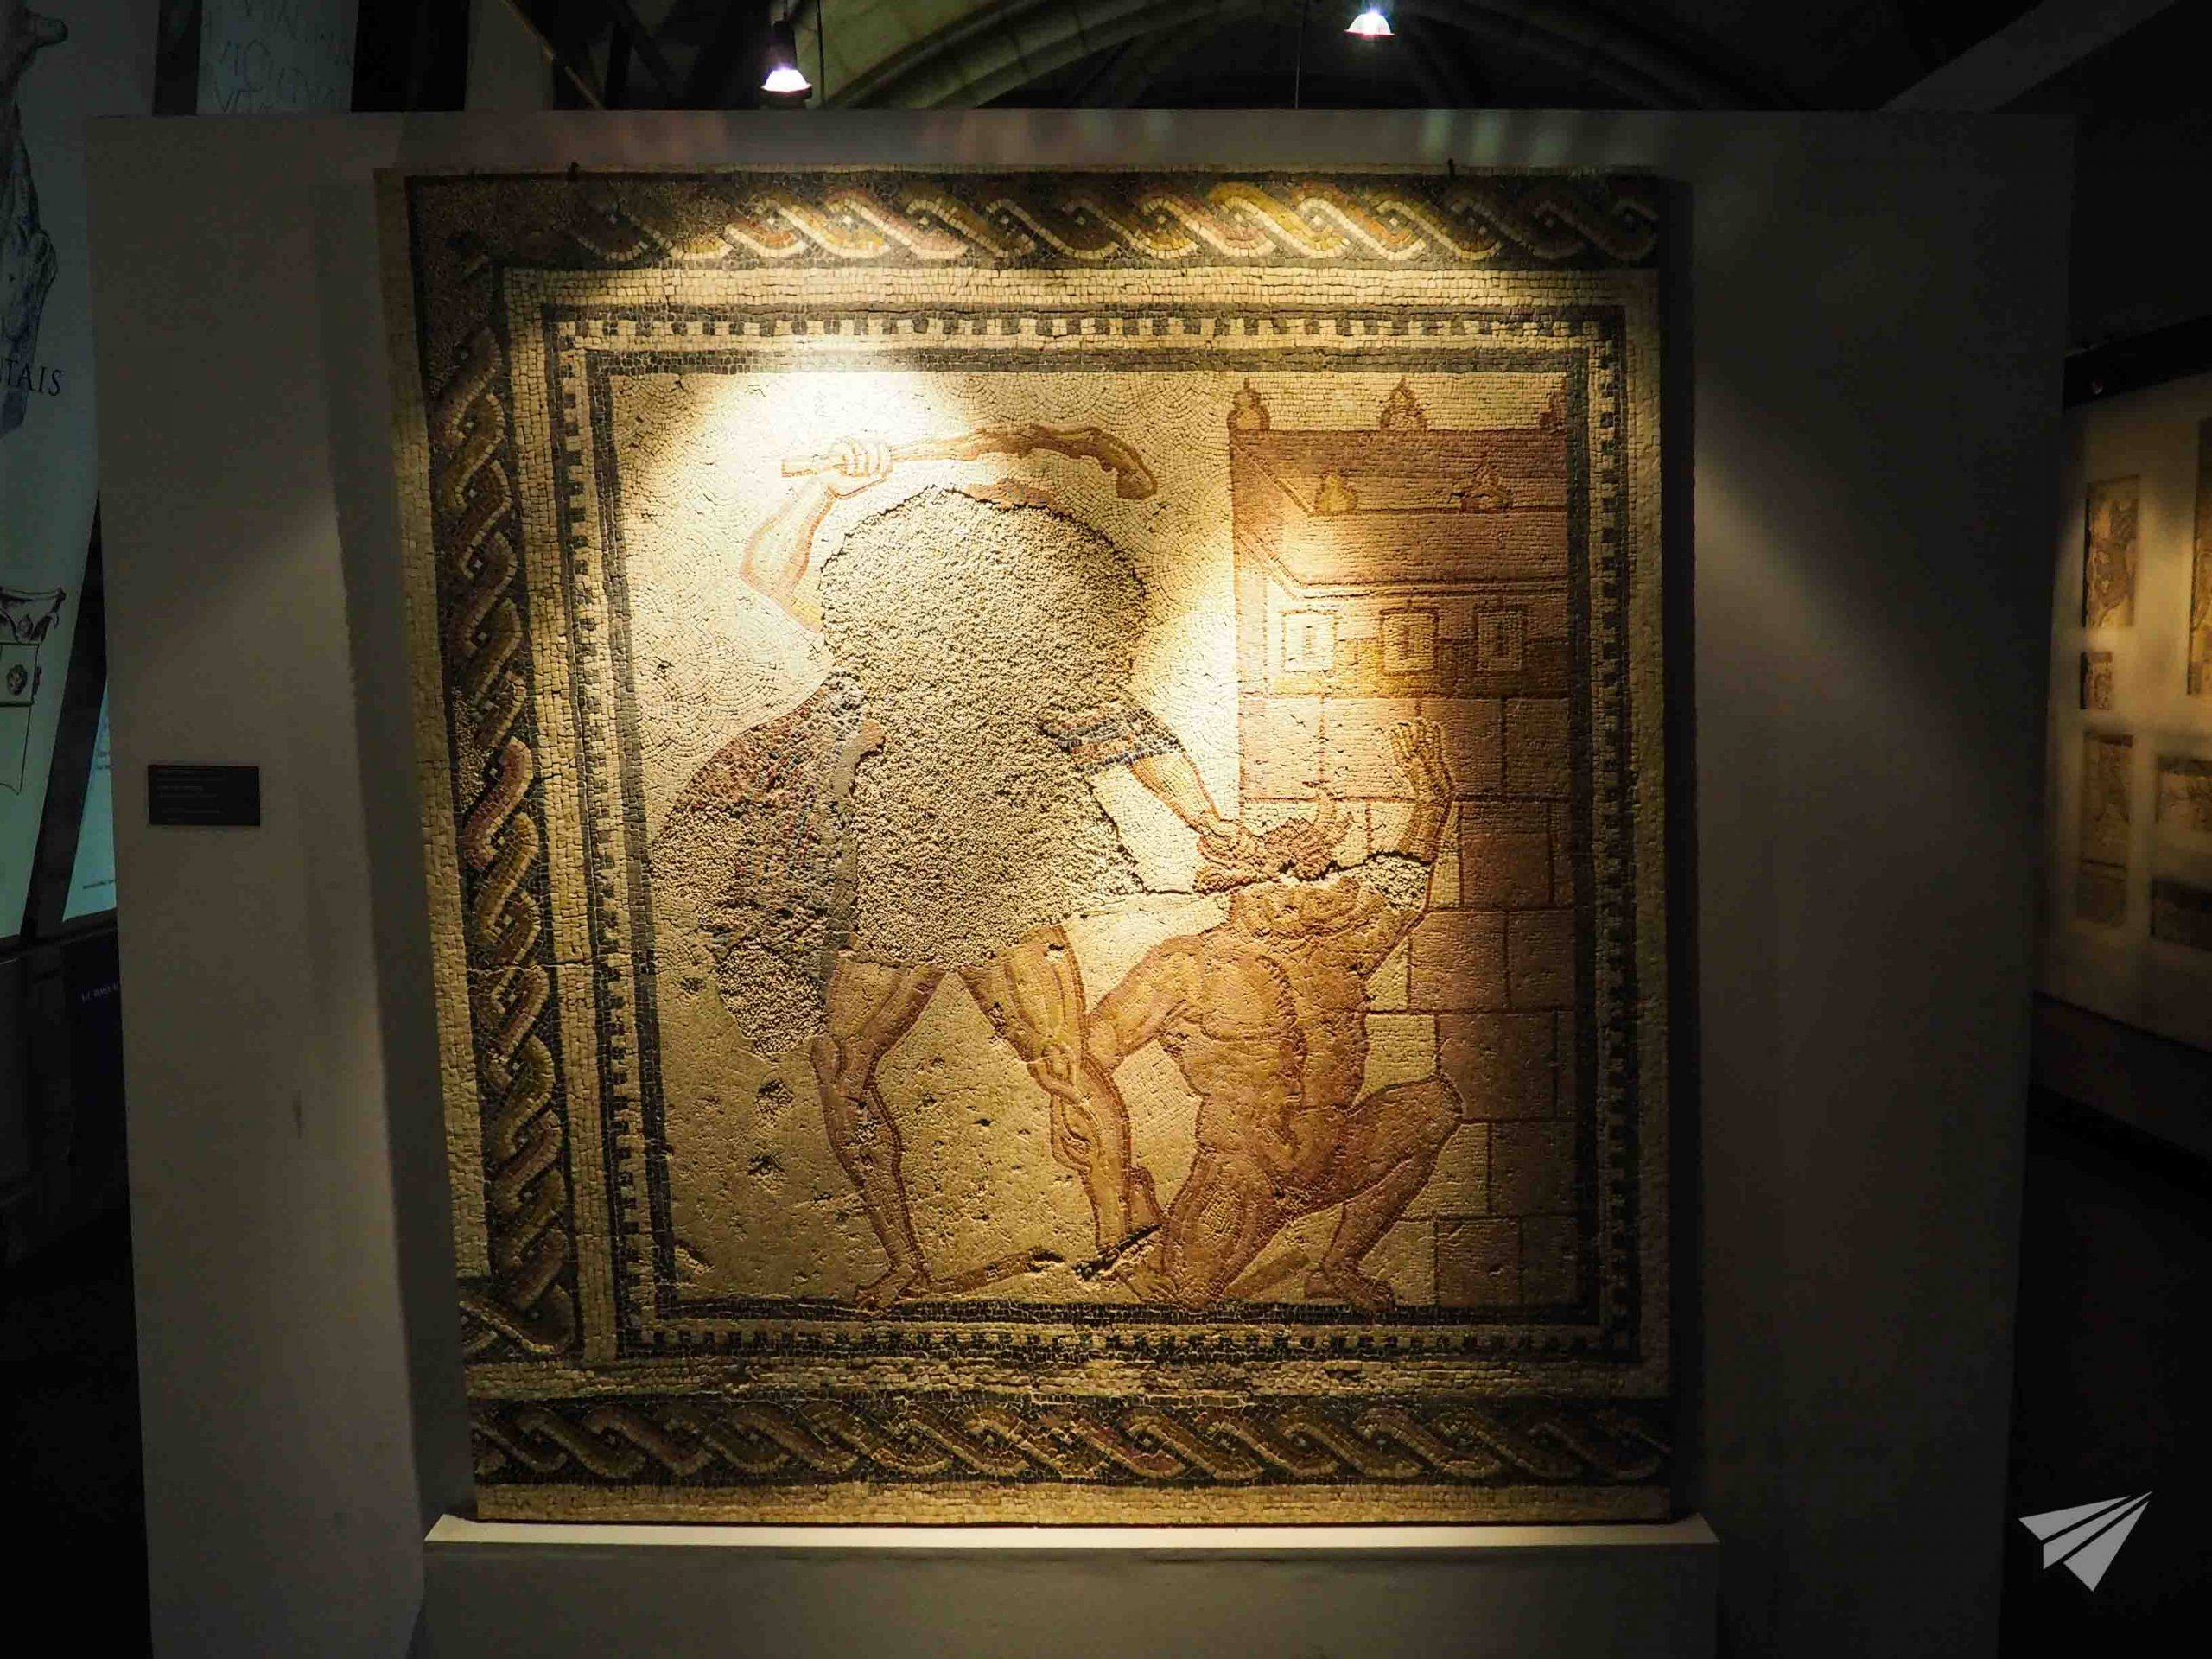 Museu Nacional de Arqueologia Lisboa artefact